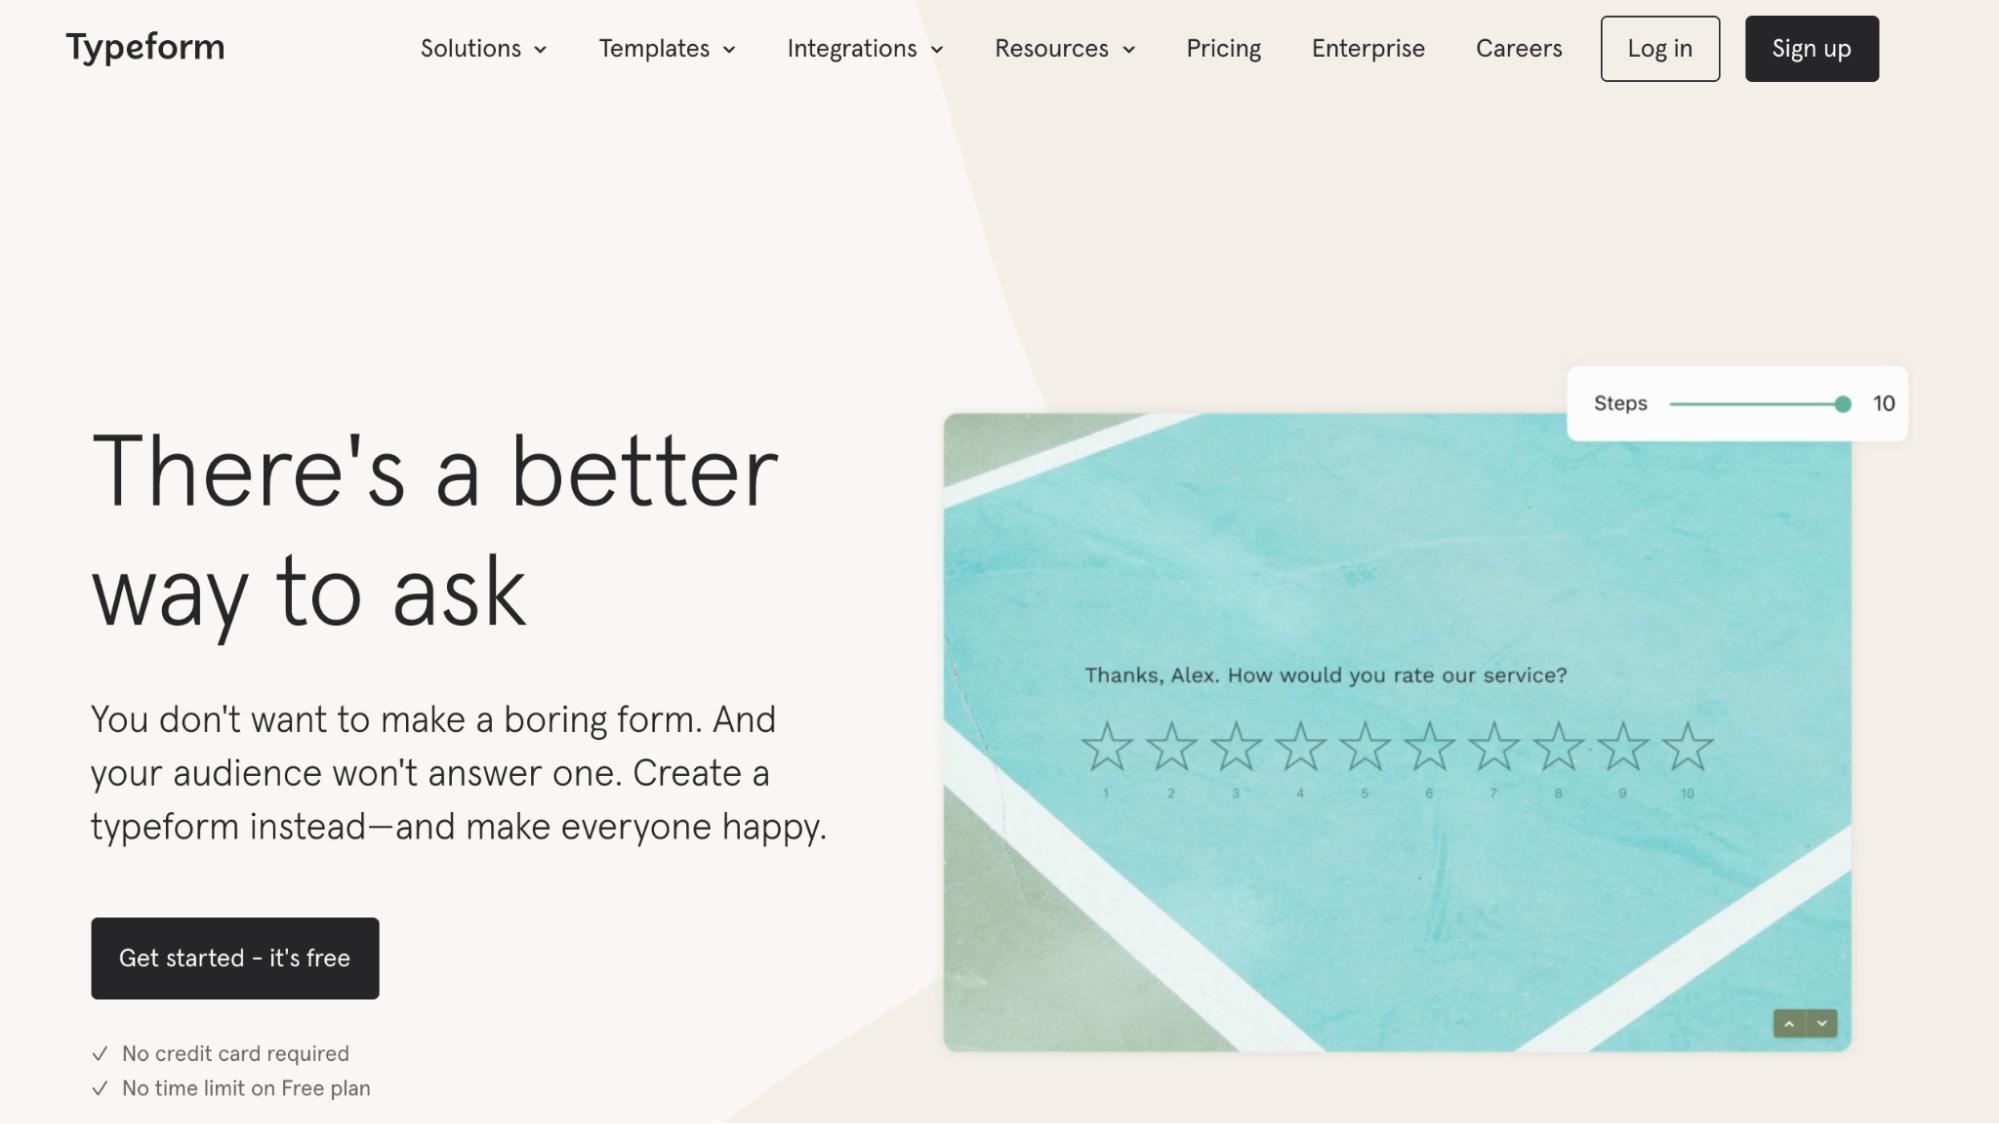 SaaS Marketing Automation Tools: Typeform Screenshot